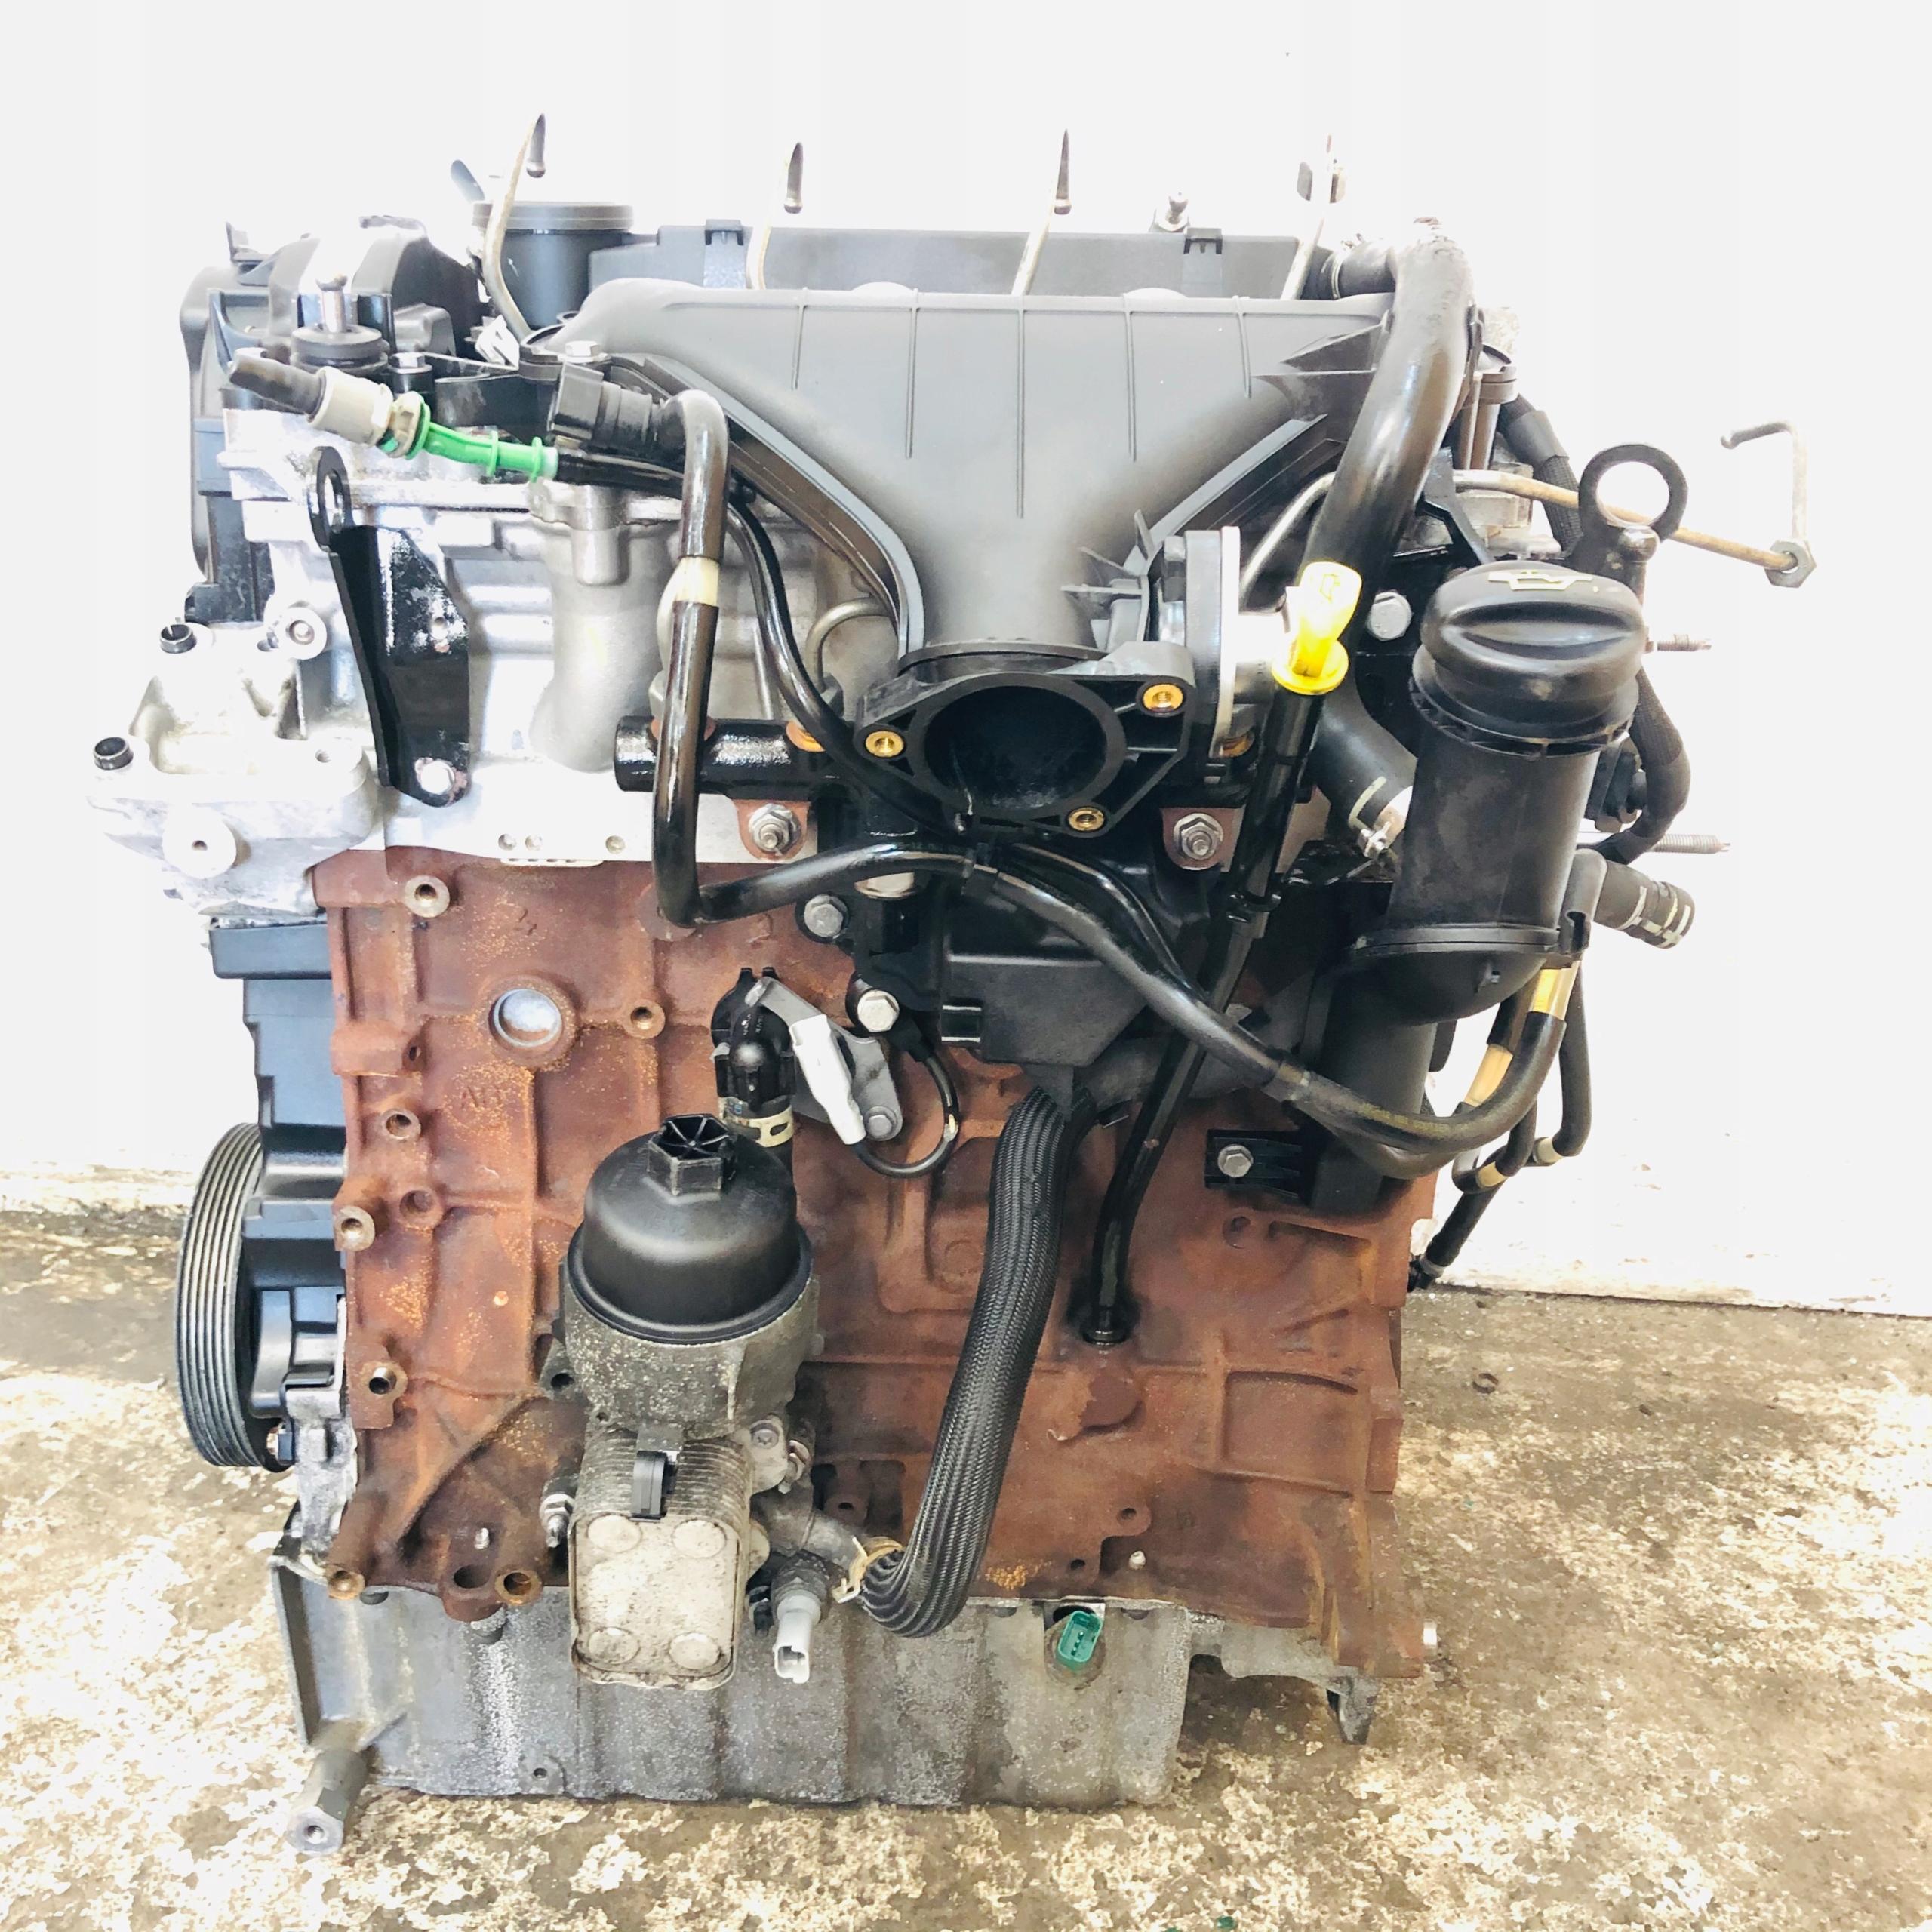 двигатель 2 0 hdi rh01 rhr peugeot citroen 83tys